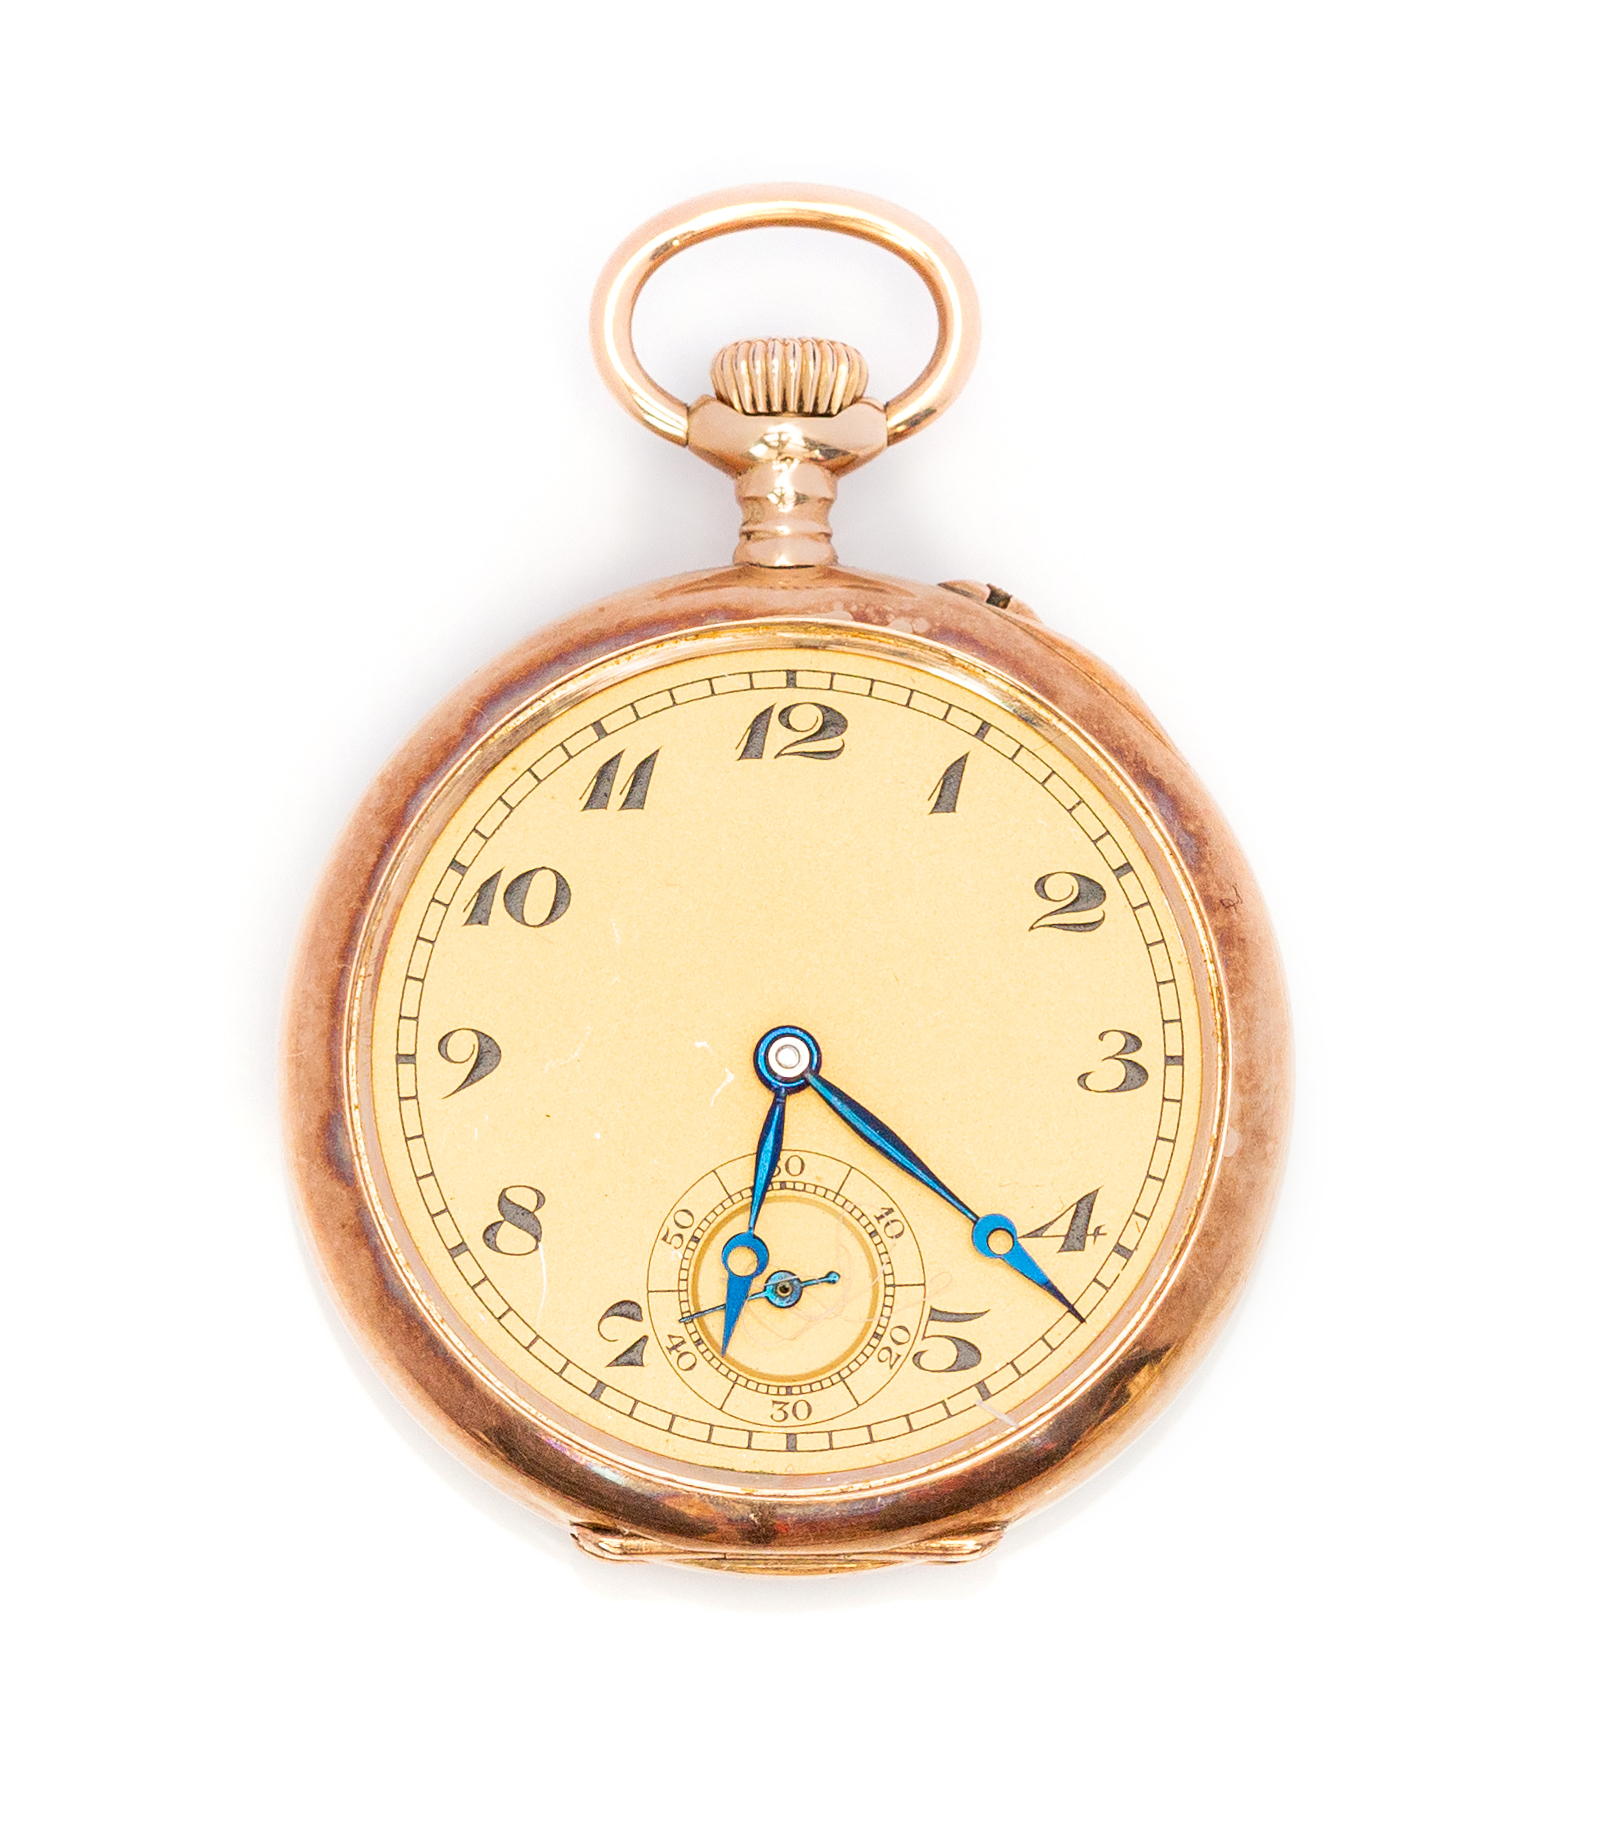 Lot 187 - IWC - International Watch Company, an early 20th Century lady's IWC 14kt gold fob watch, 2.